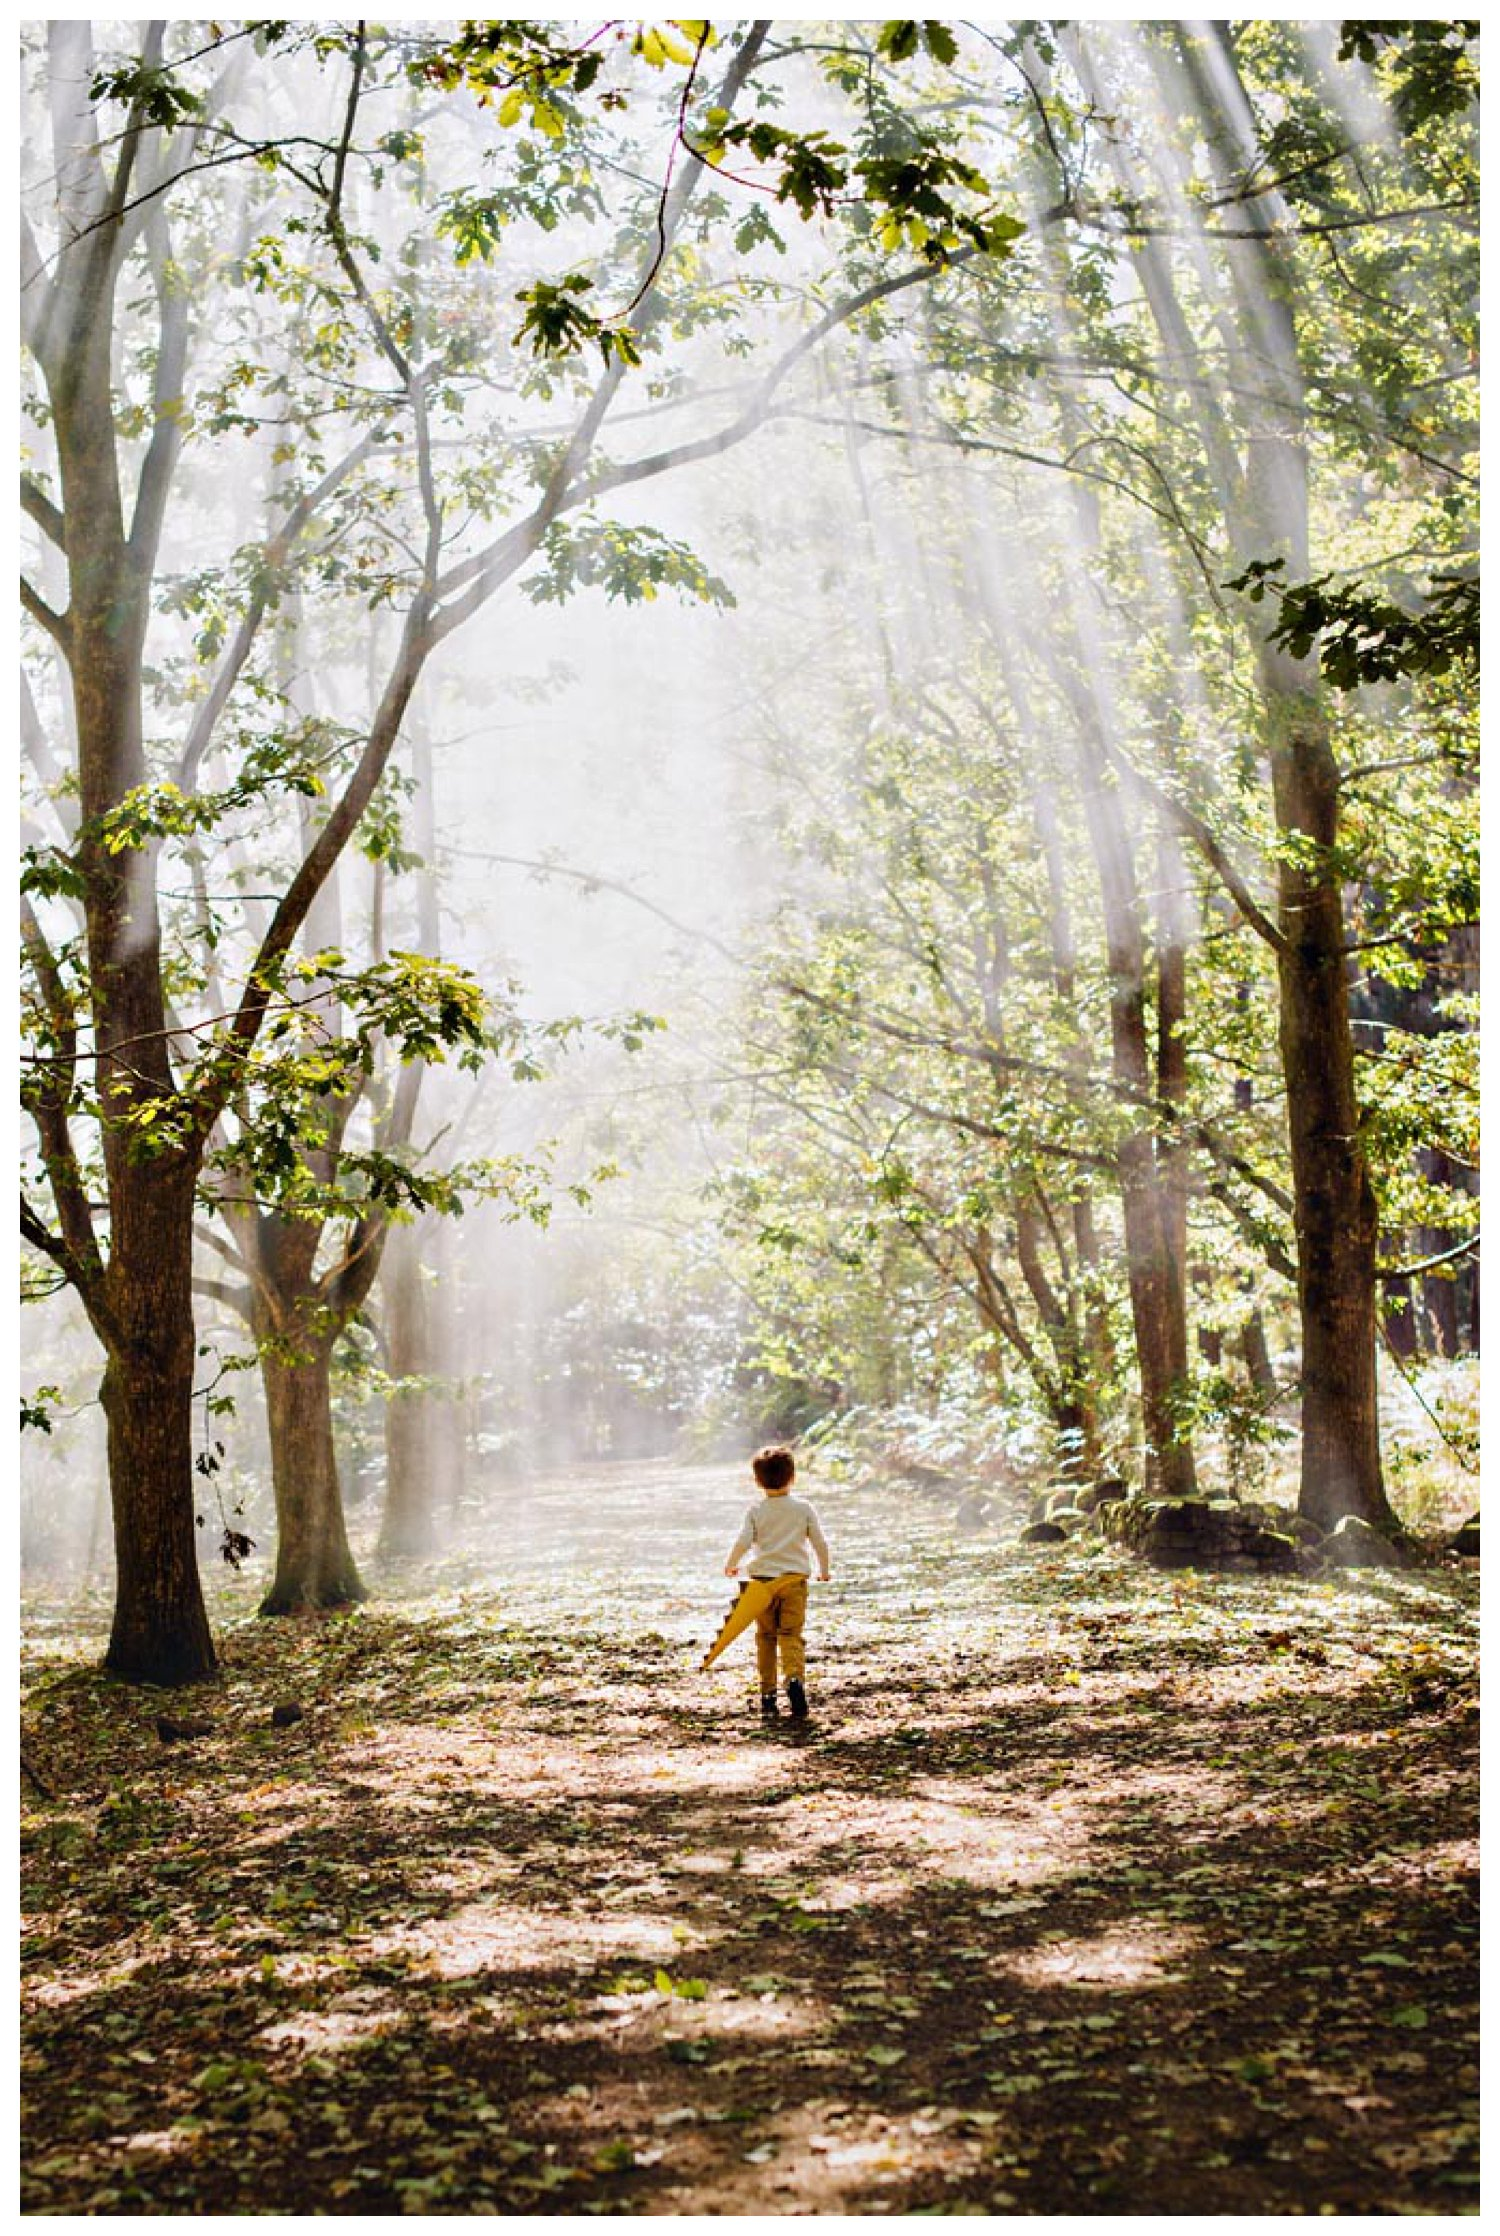 Launceston_family_photography_Anjie_Blair_07.jpg